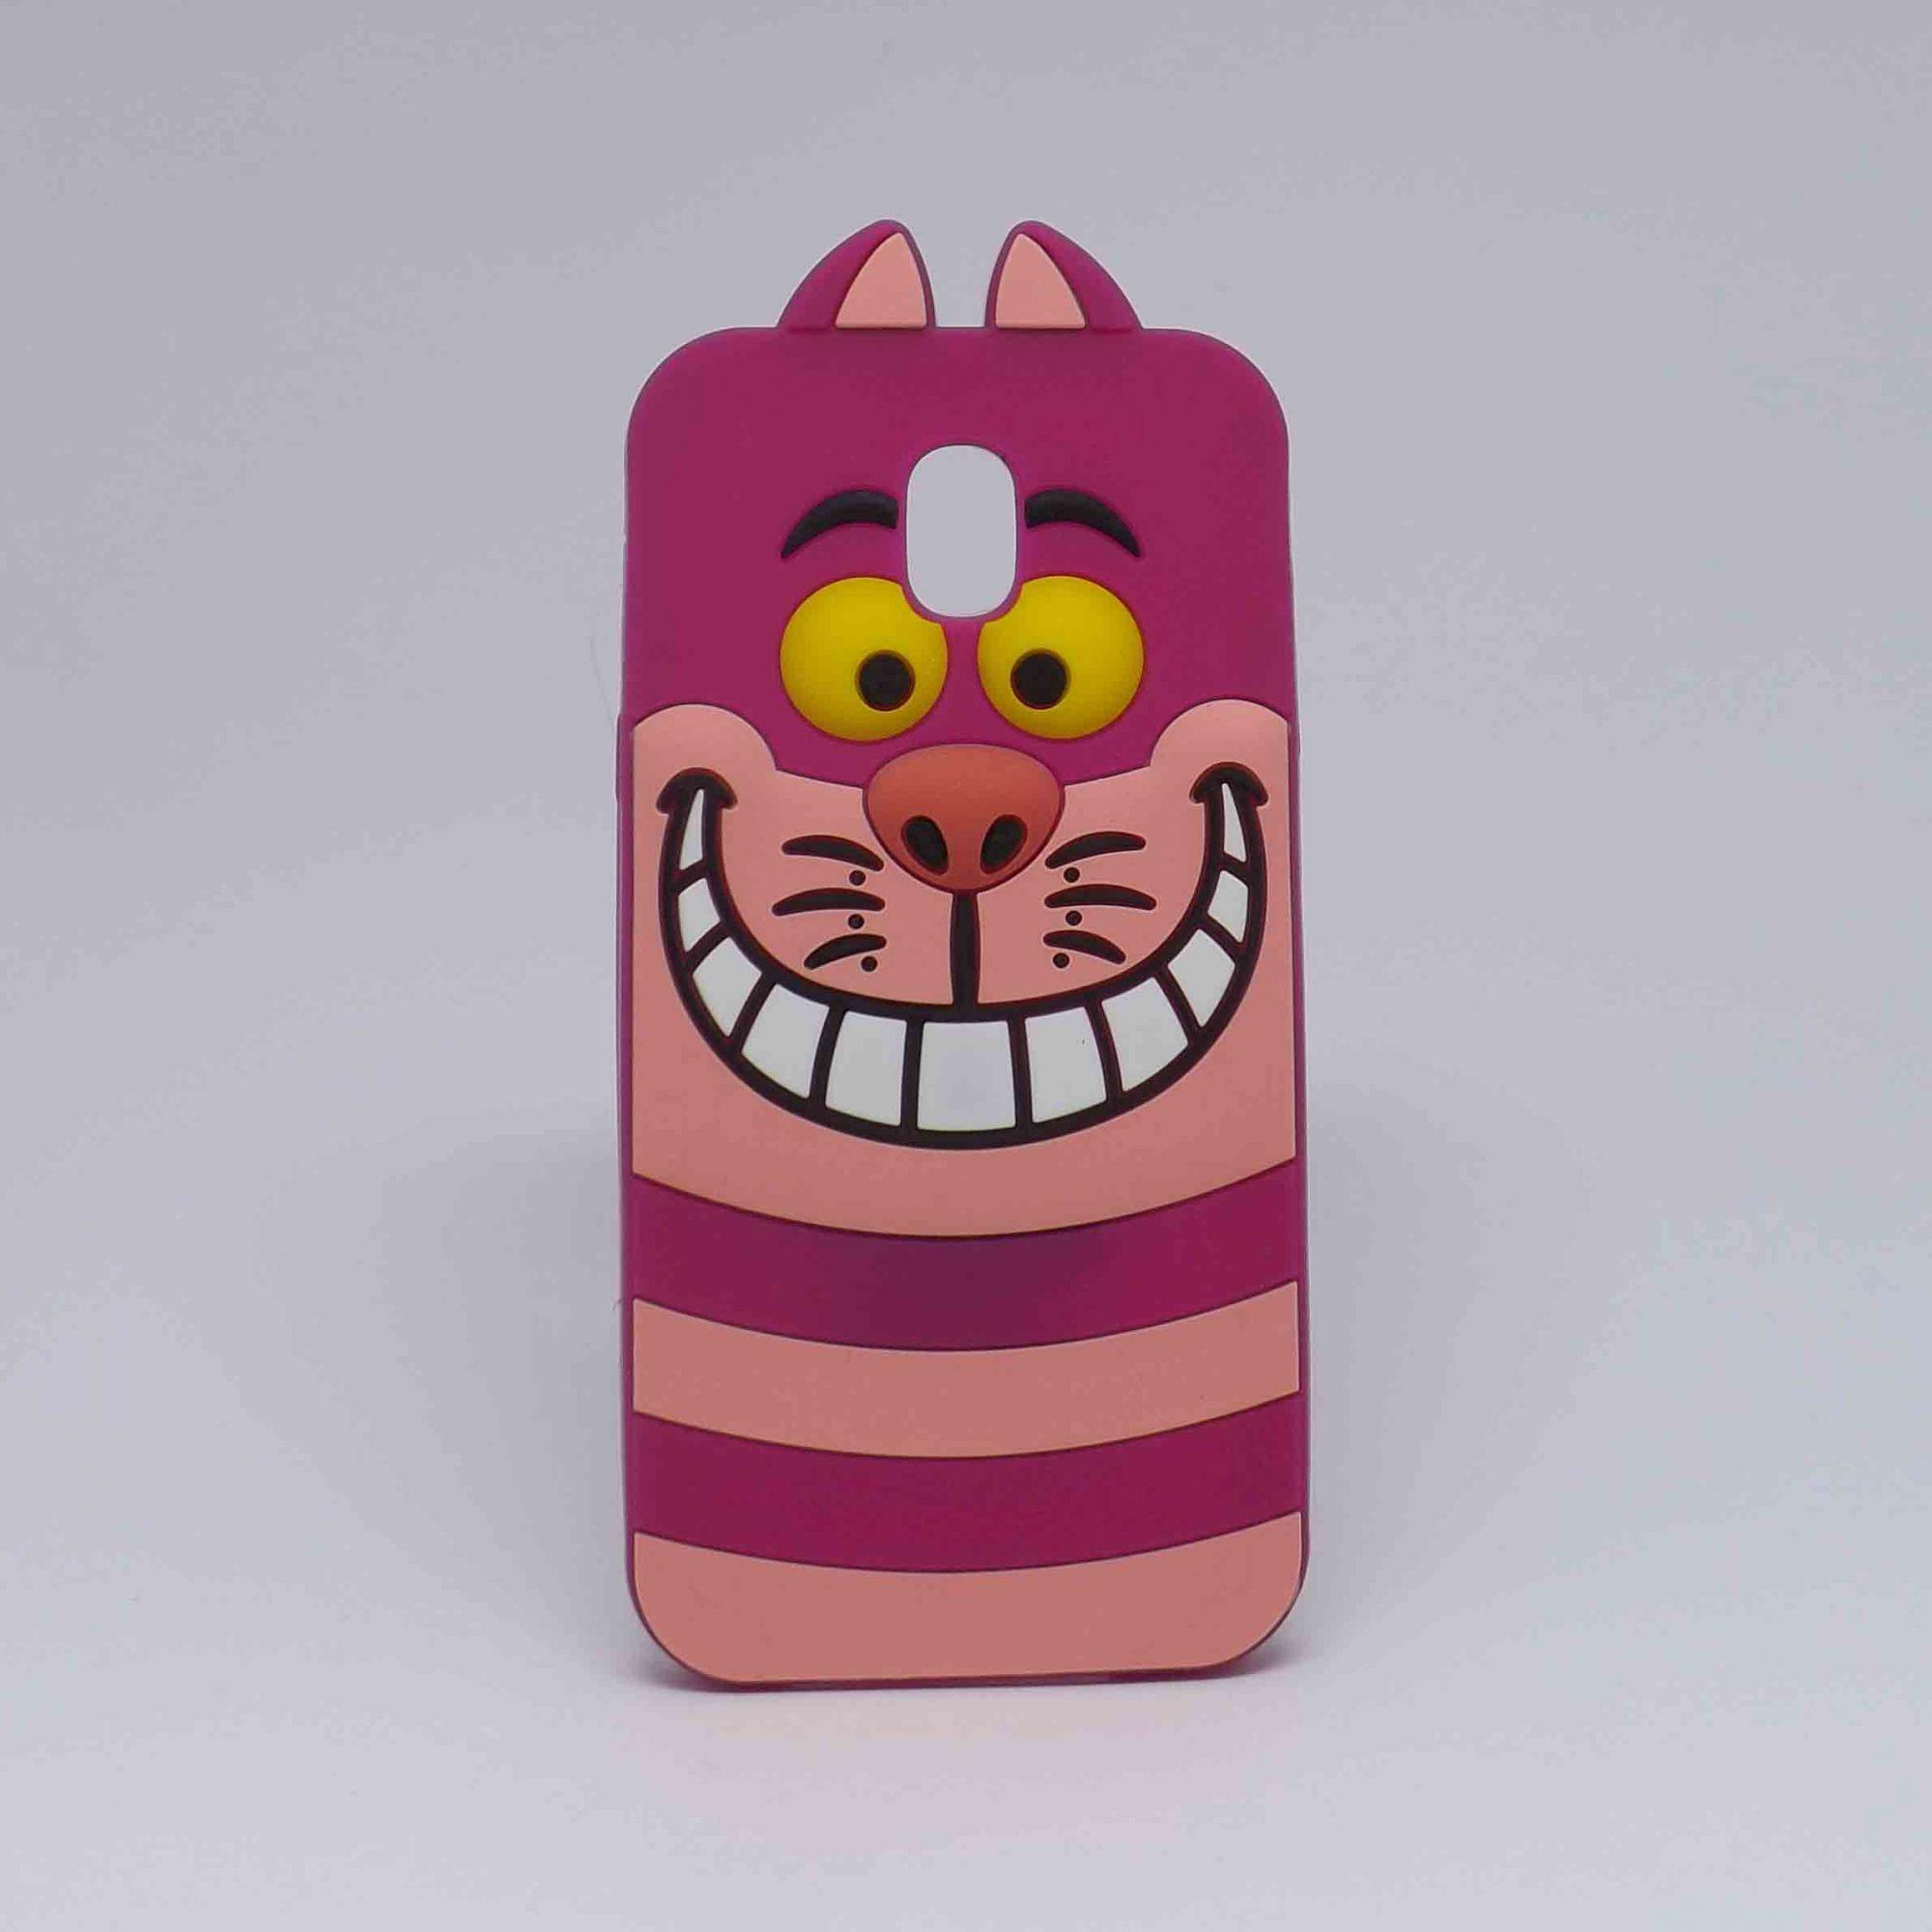 Capa Samsung Galaxy J5 Pro Personagens - Gato Risonho